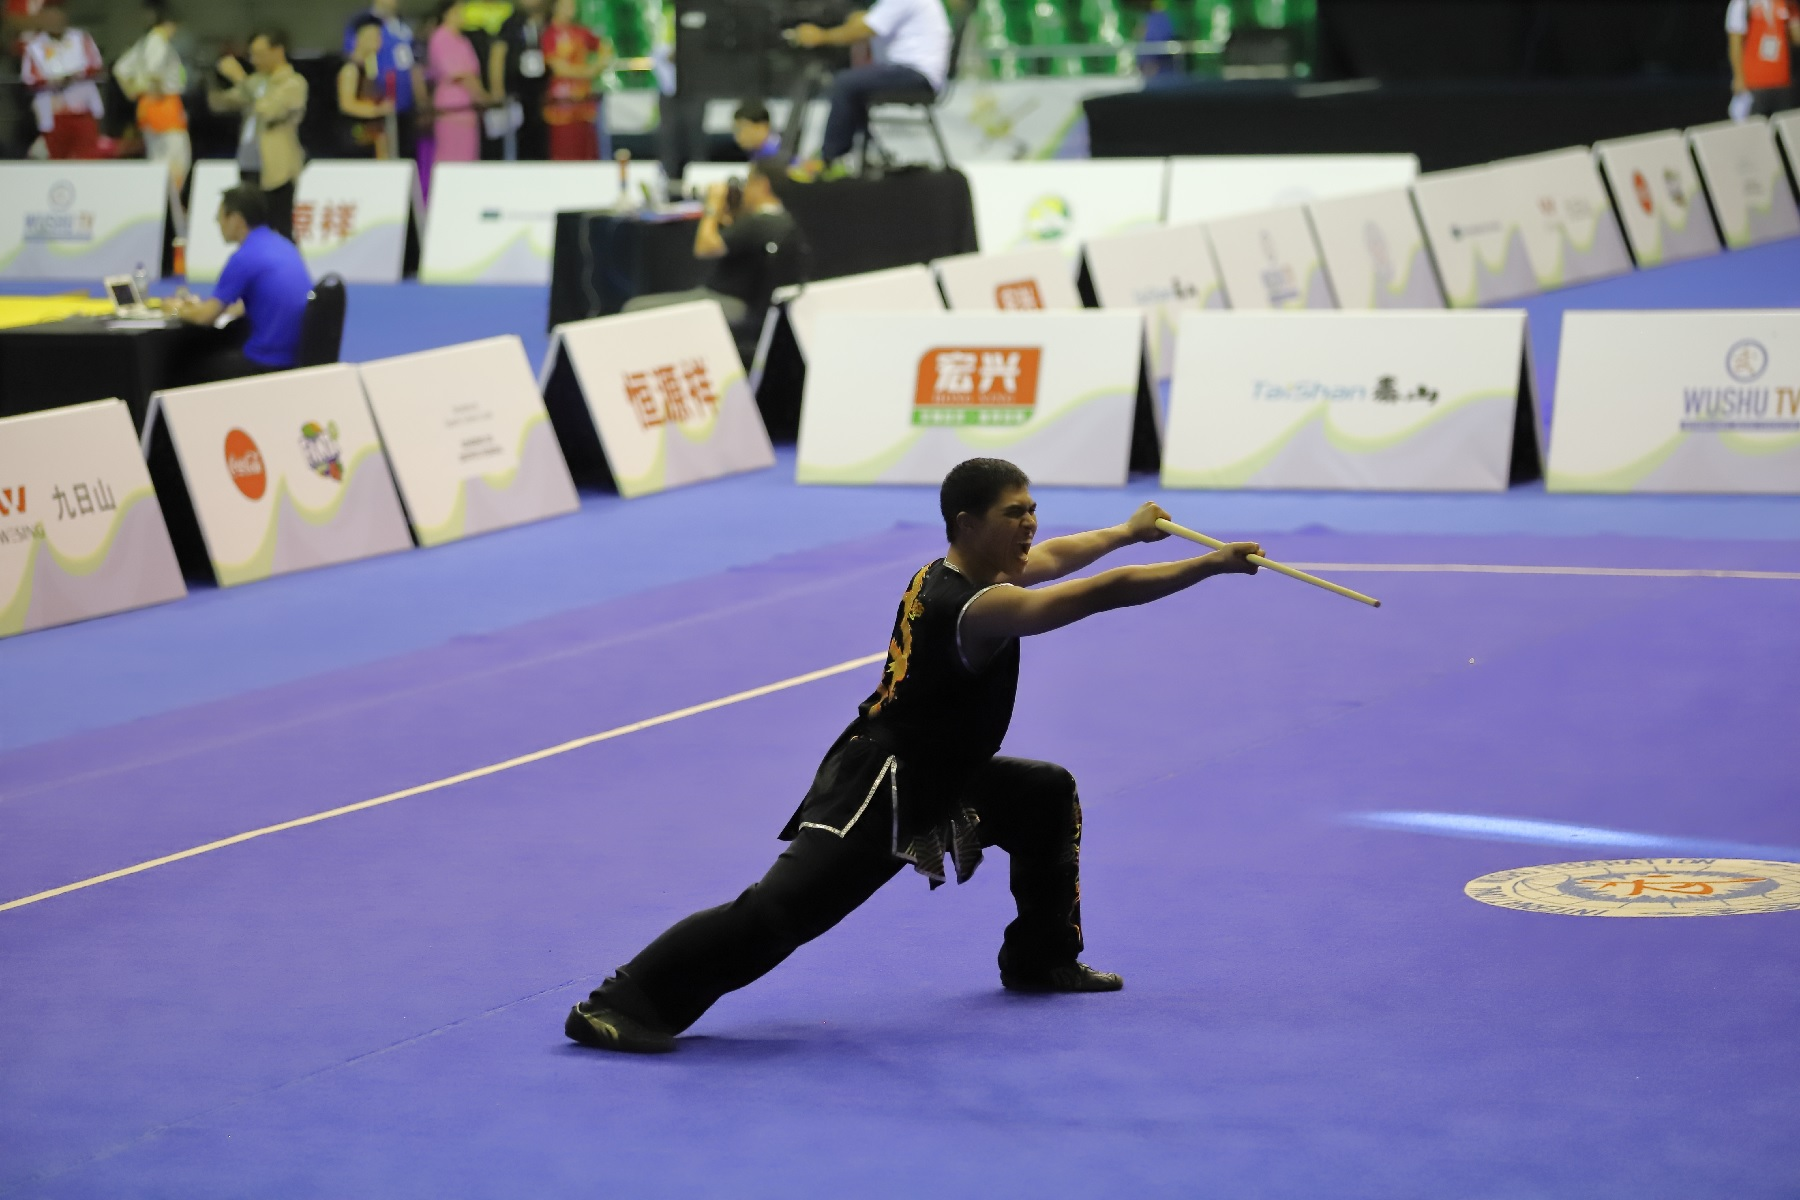 wayland-li-wushu-brazil-world-junior-wushu-championships-2018-team-canada-14.jpg